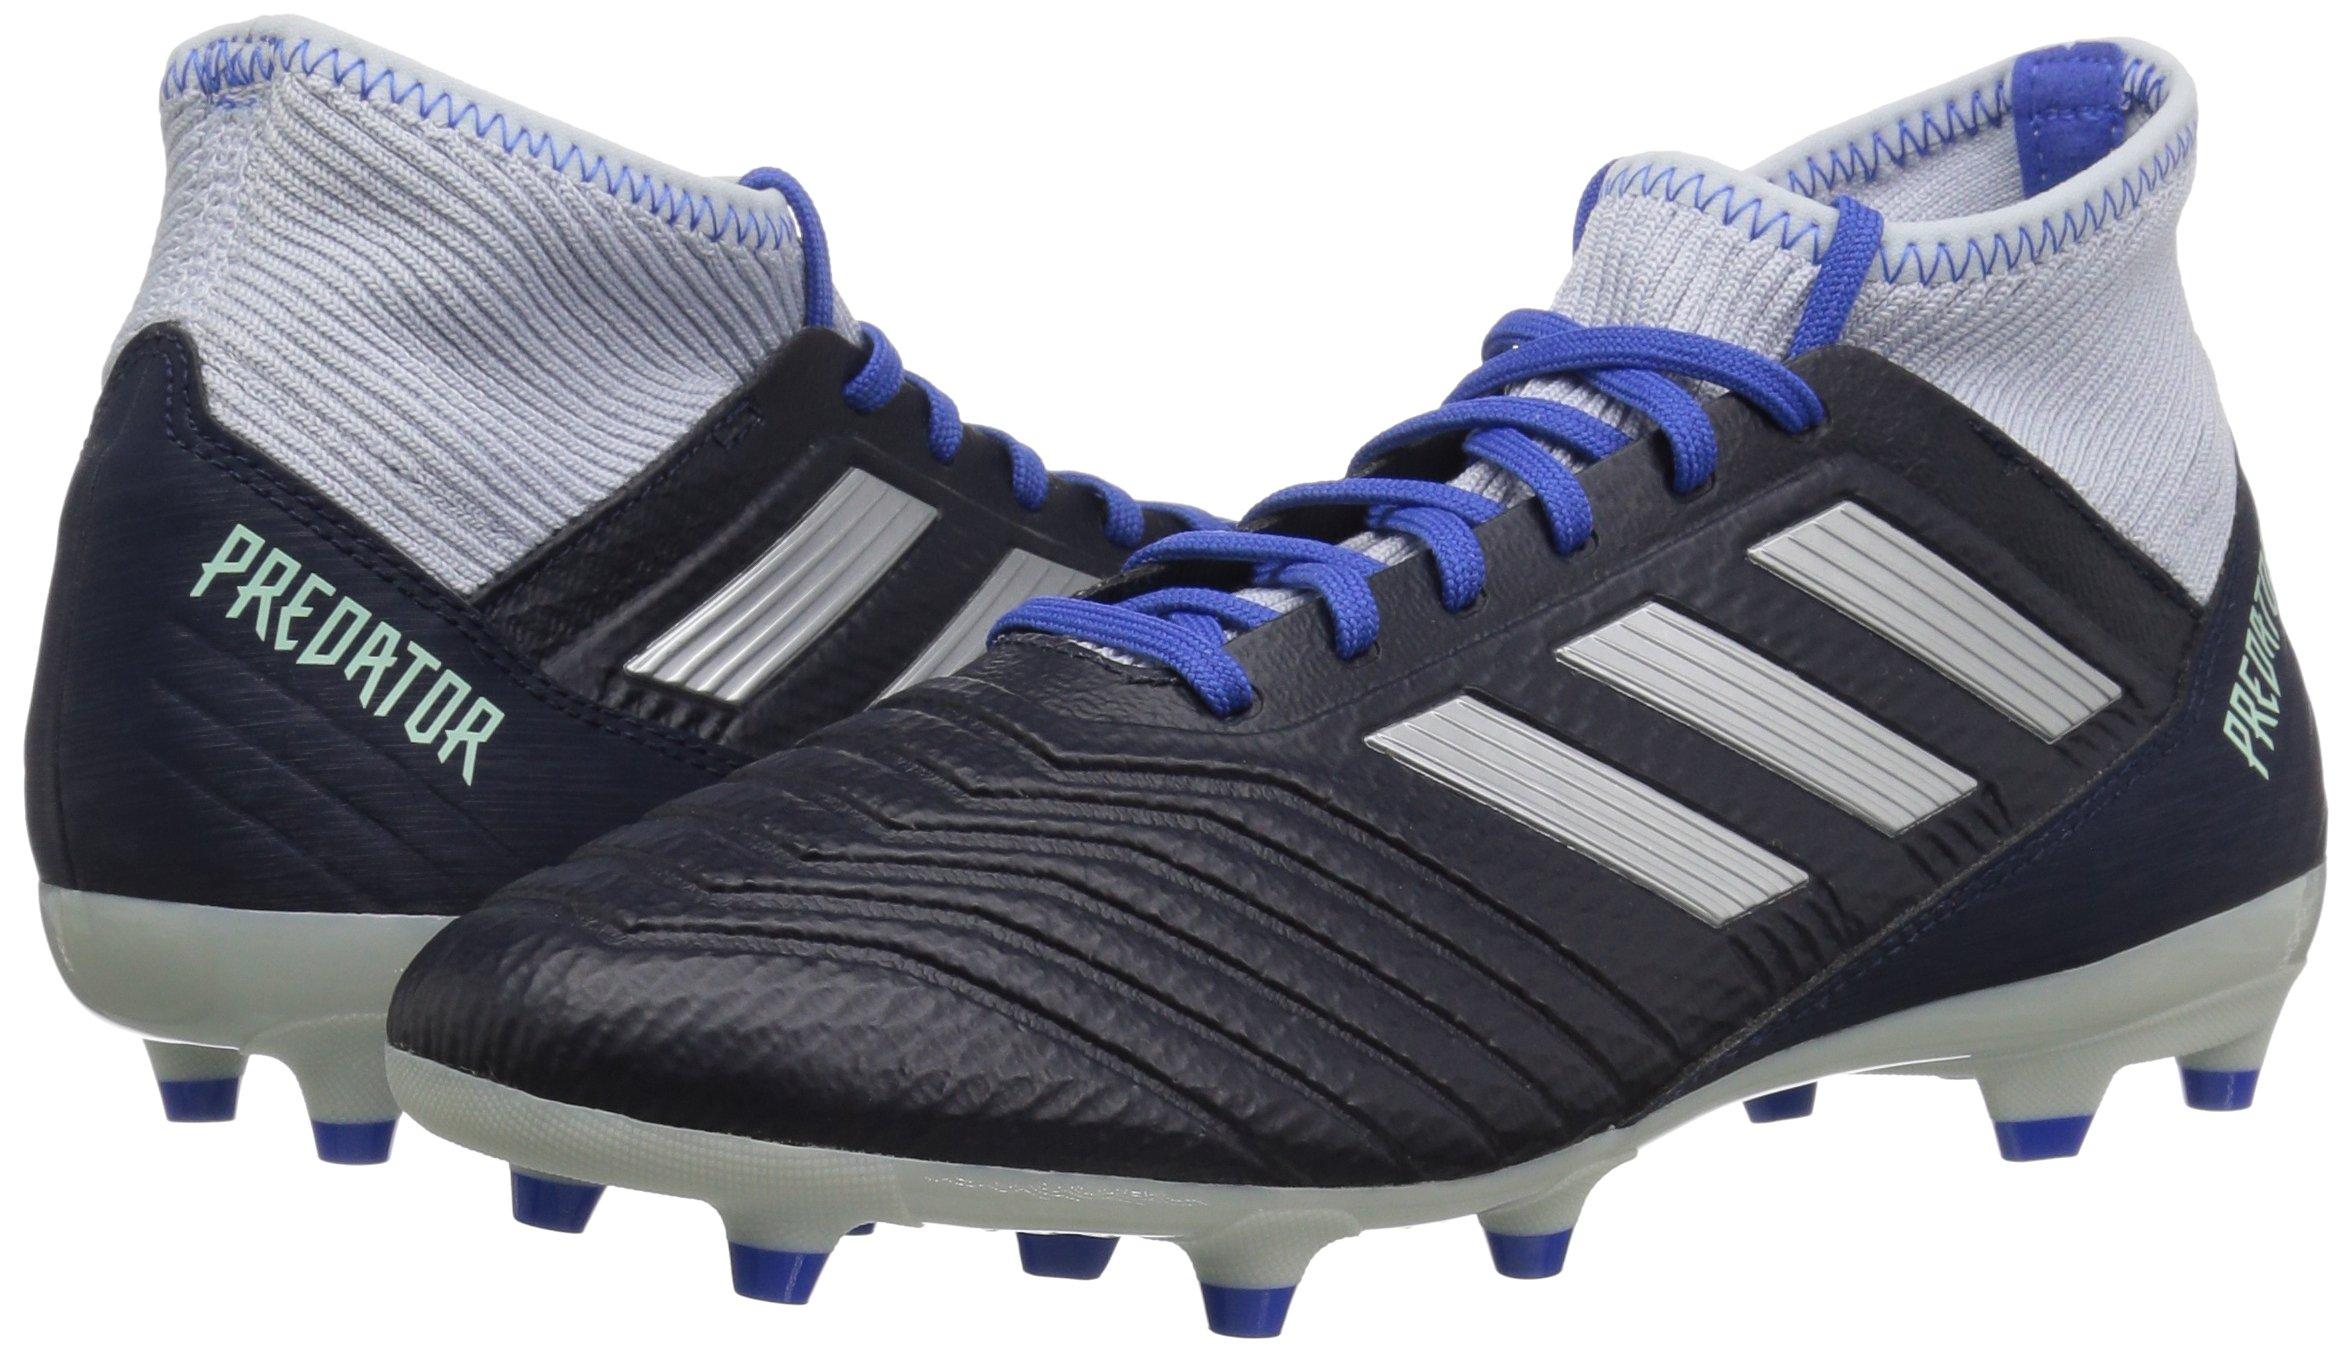 adidas Women's Predator 18.3 Firm Ground Soccer Shoe Legend Ink/Silver Metallic/aero Blue 5.5 M US by adidas (Image #5)